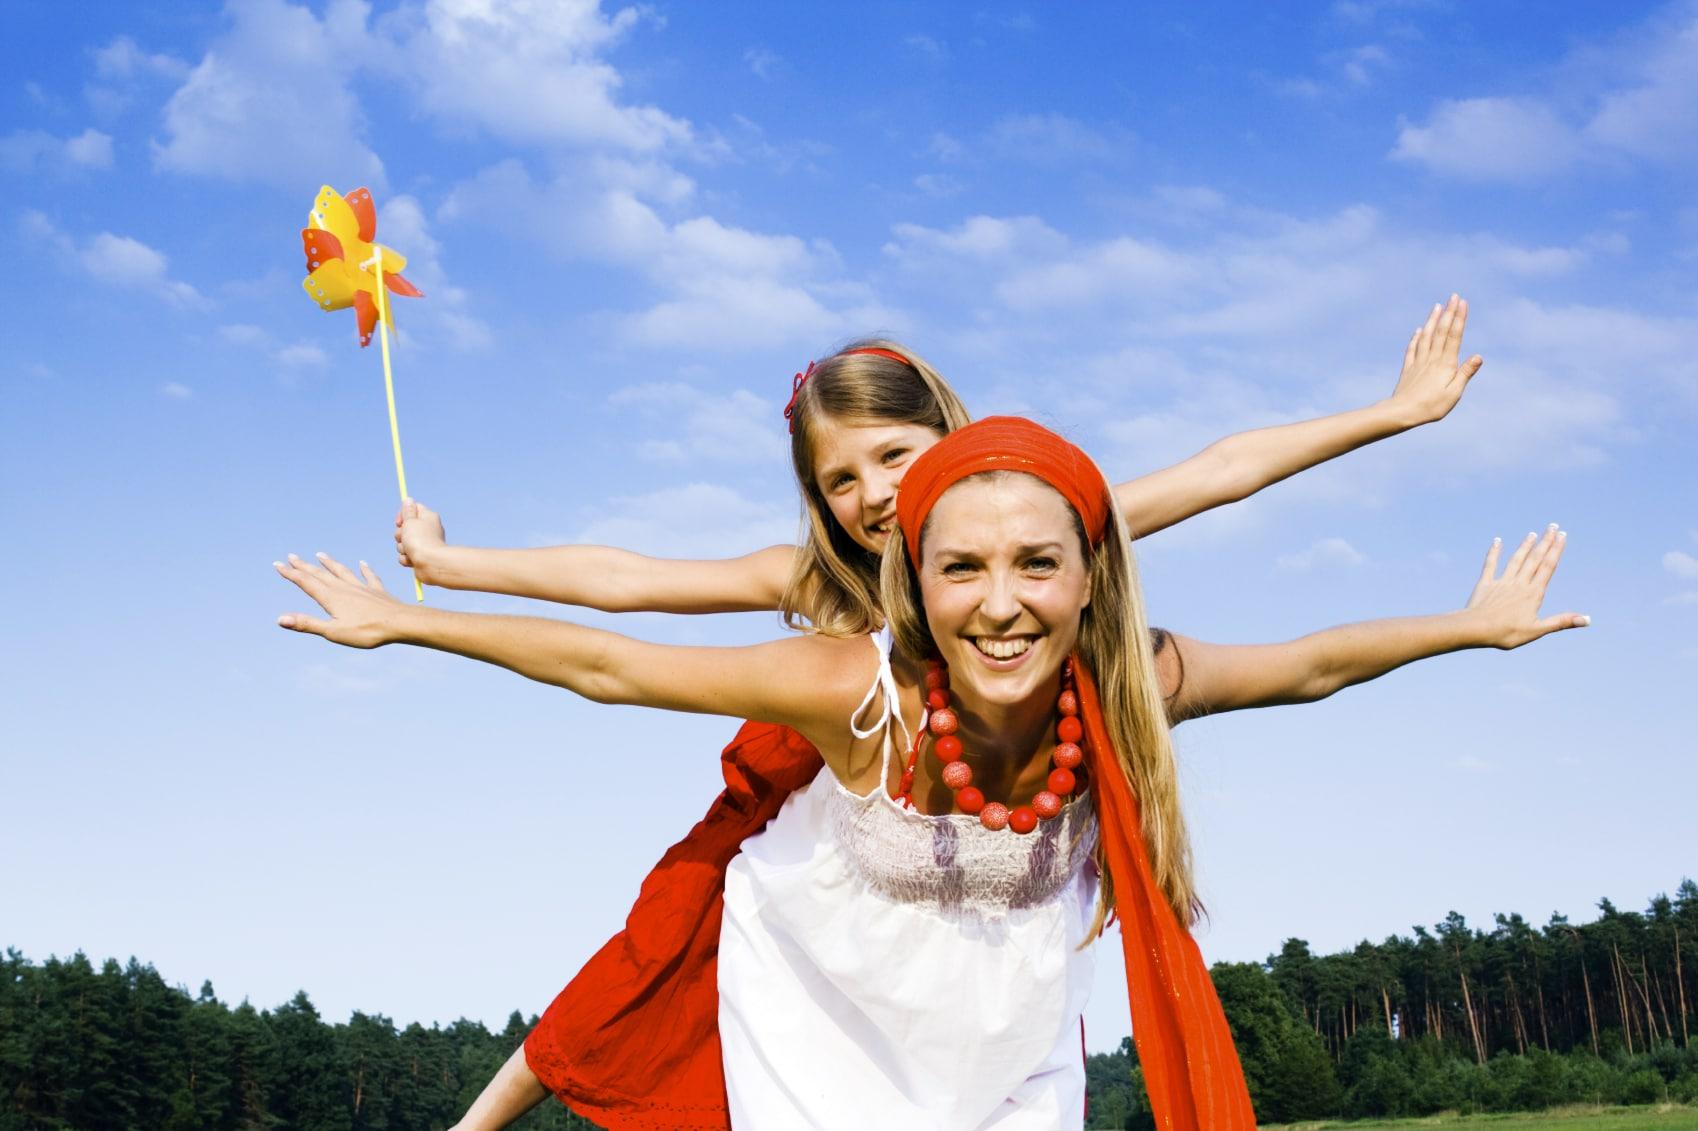 Phee: Ιστορίες με φύκια και όχι… μεταξωτές κορδέλες!